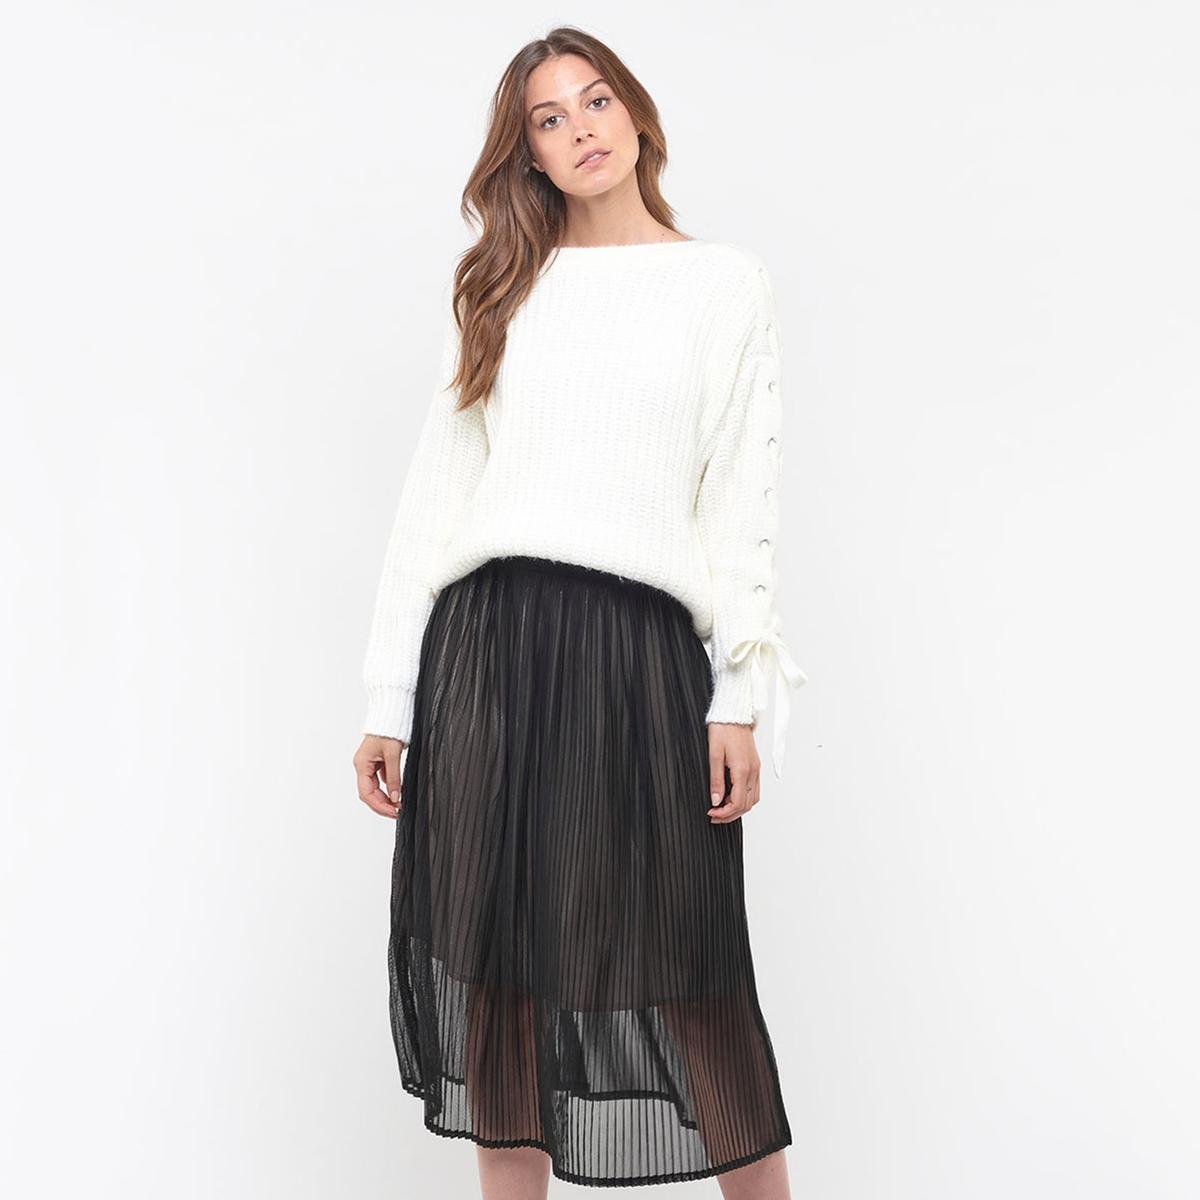 Пуловер La Redoute Из плотного трикотажа со шнуровкой на рукавах L белый пуловер la redoute из тонкого трикотажа со шнуровкой l бежевый